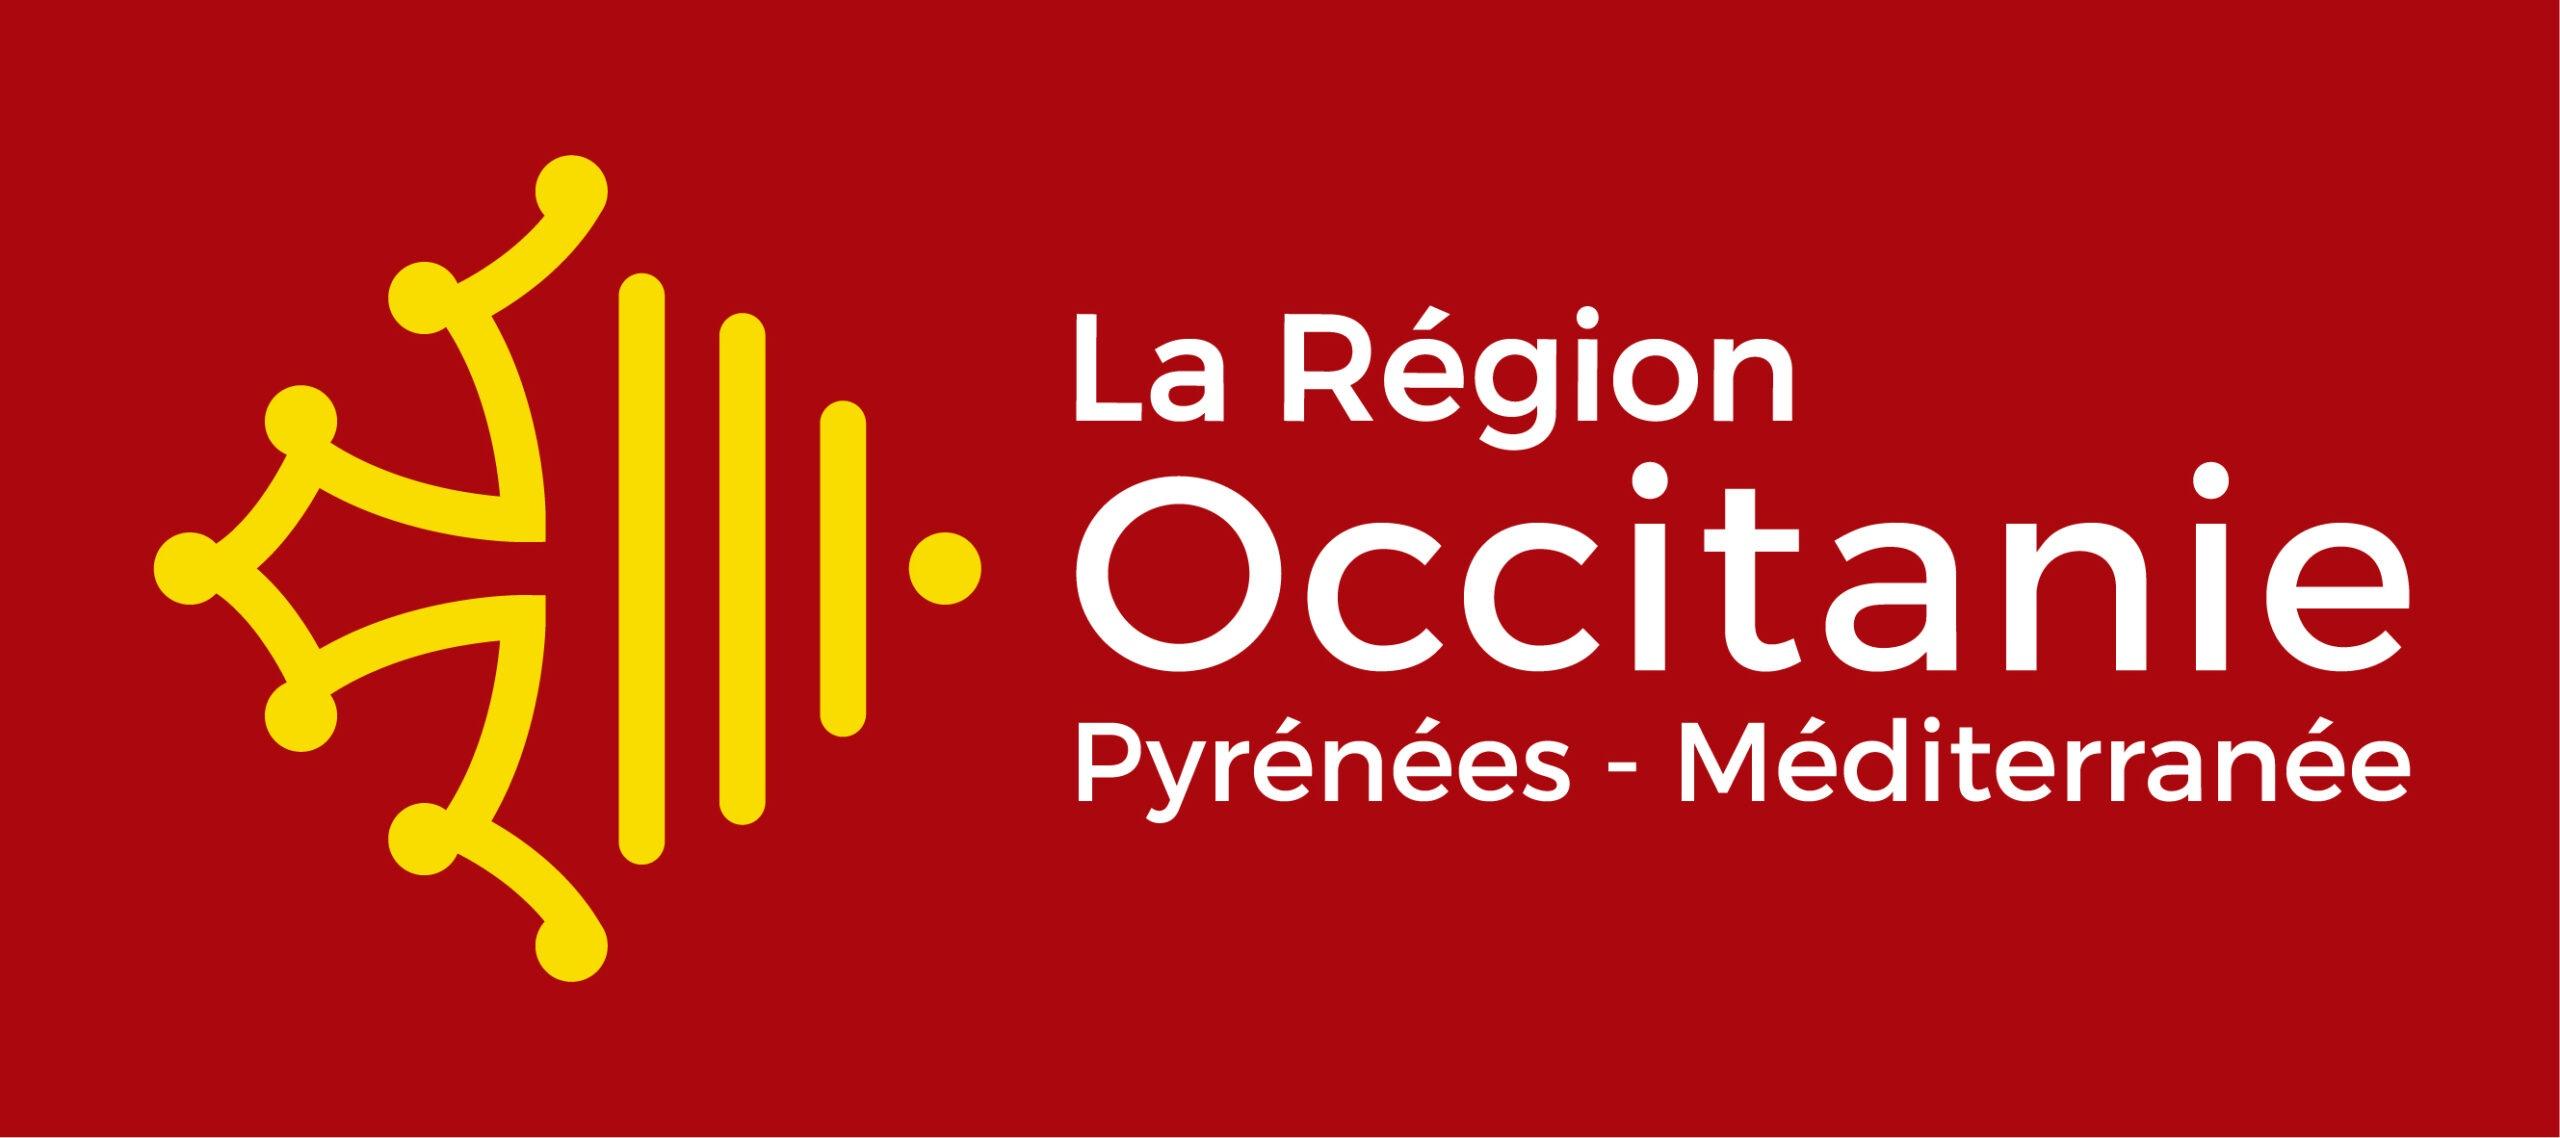 OC-1706-instit-logo rectangle-quadri-150x150-300dpi